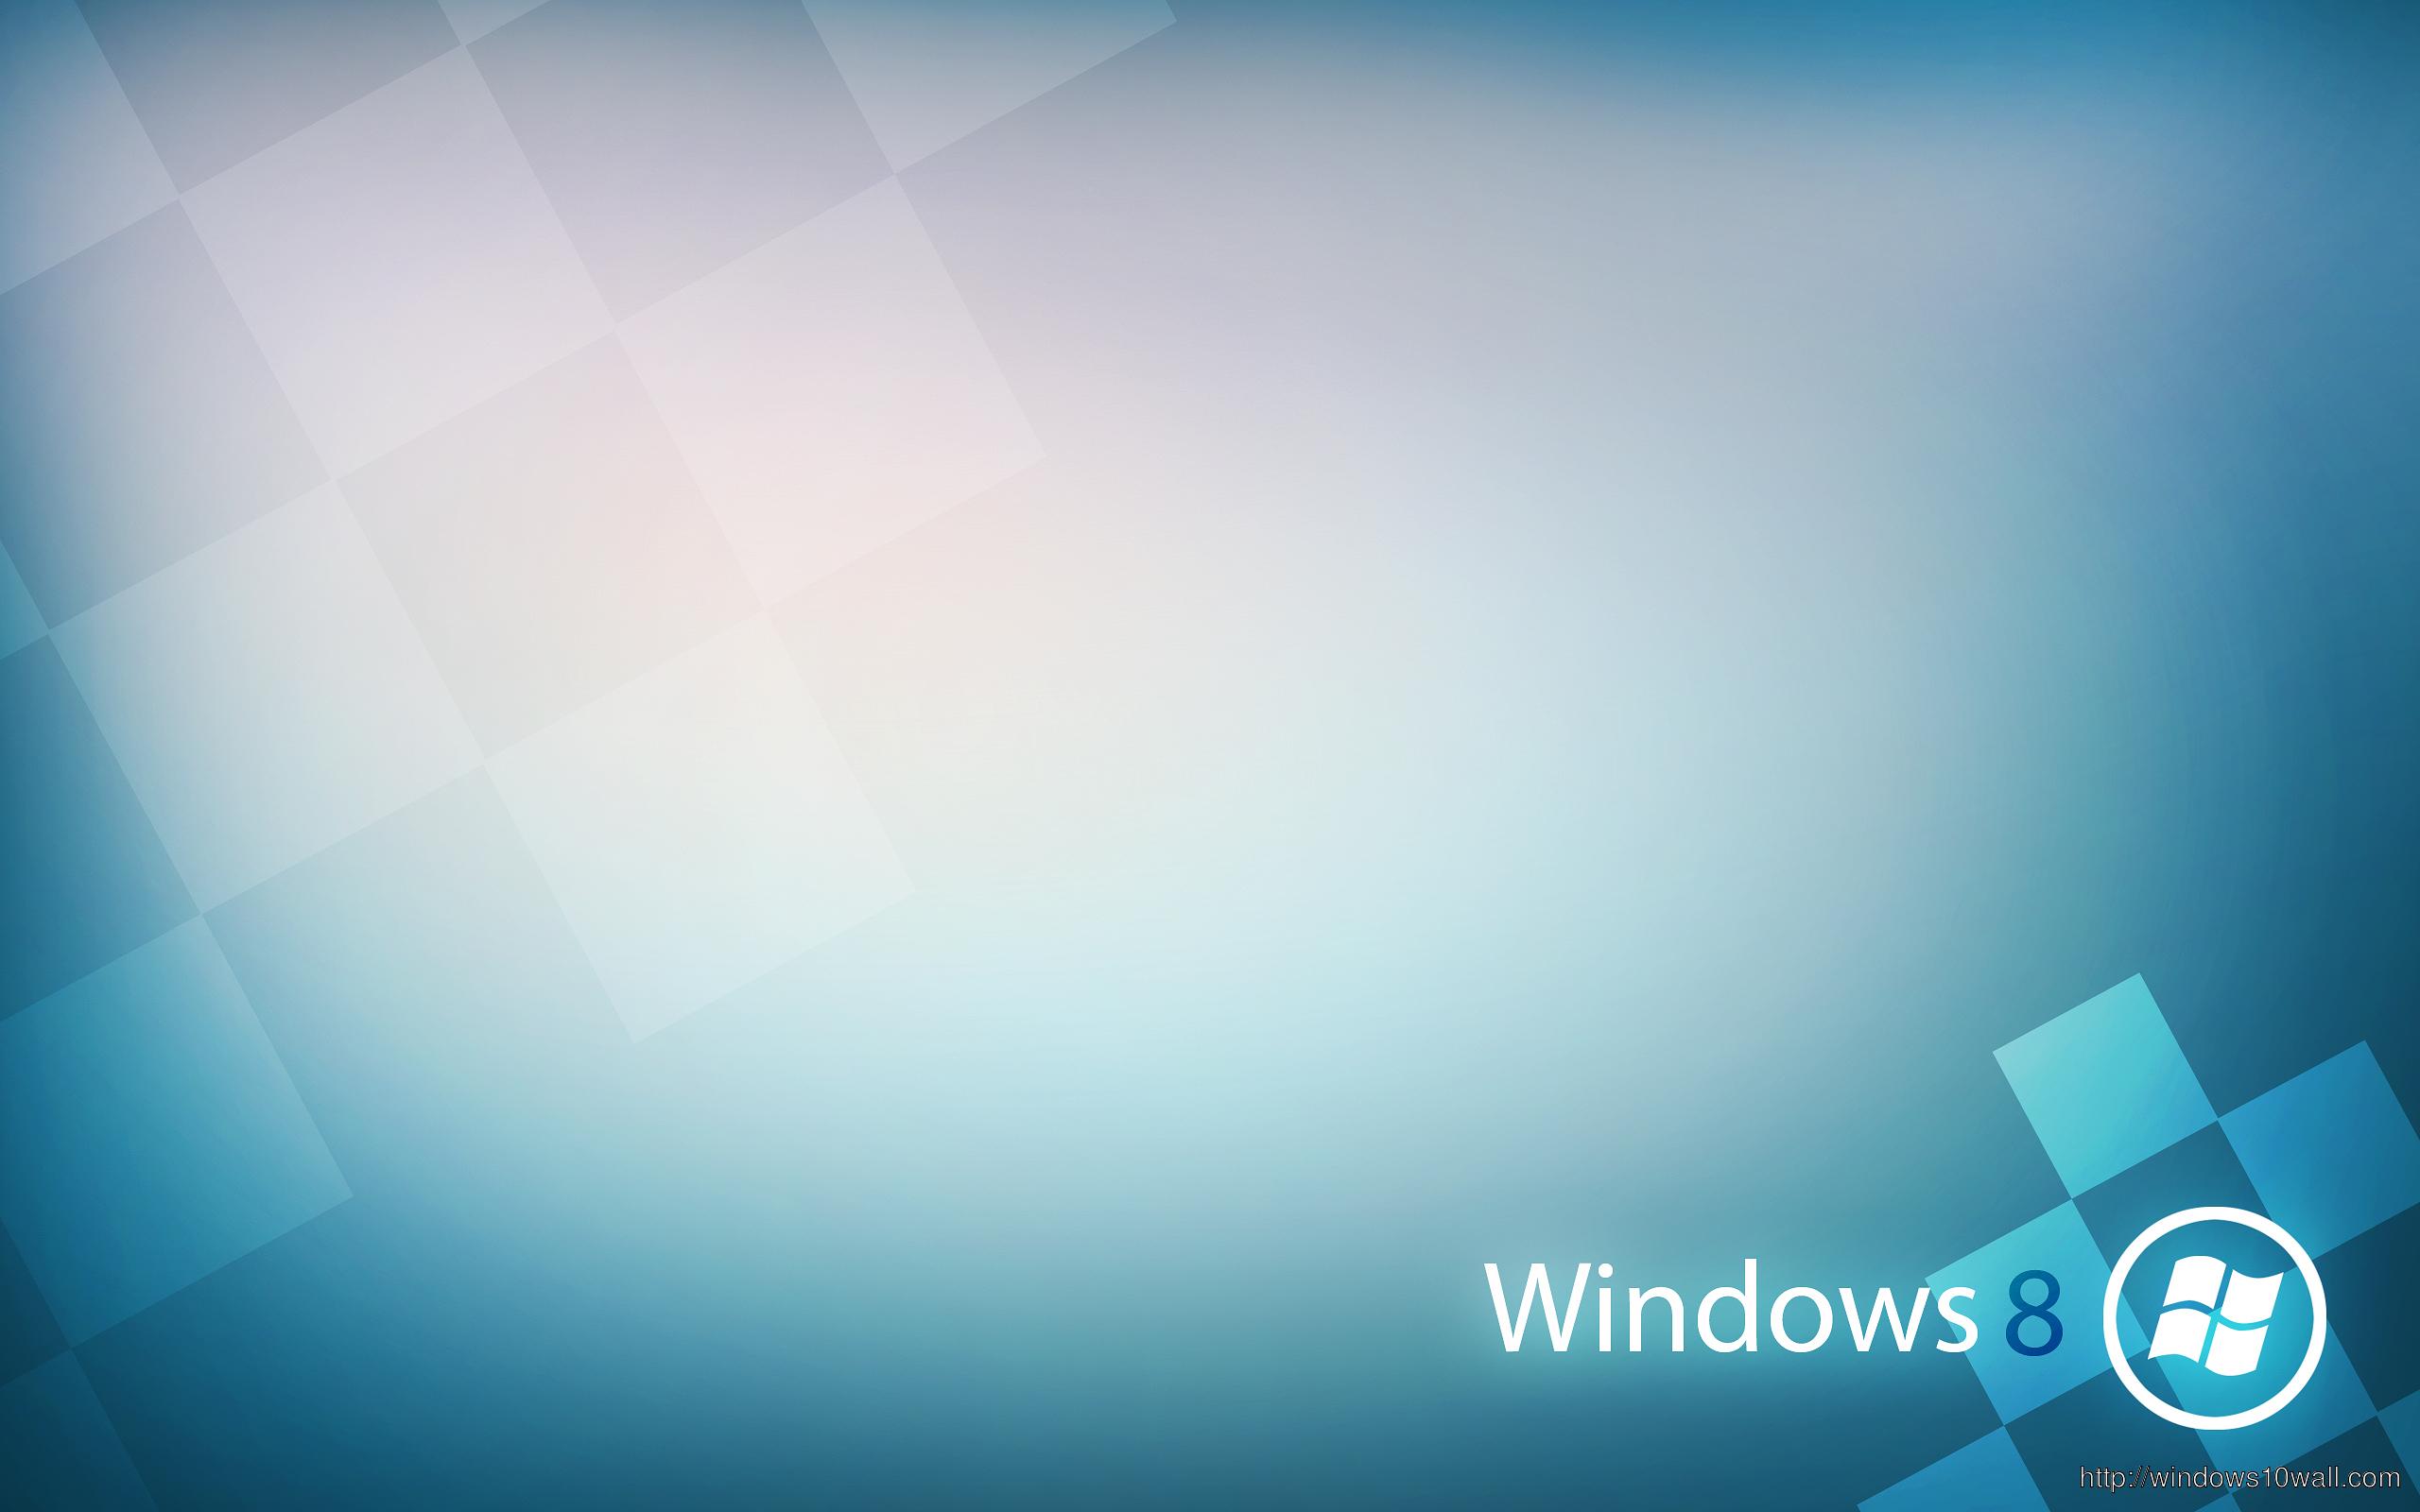 windows-8-top-wallpaper